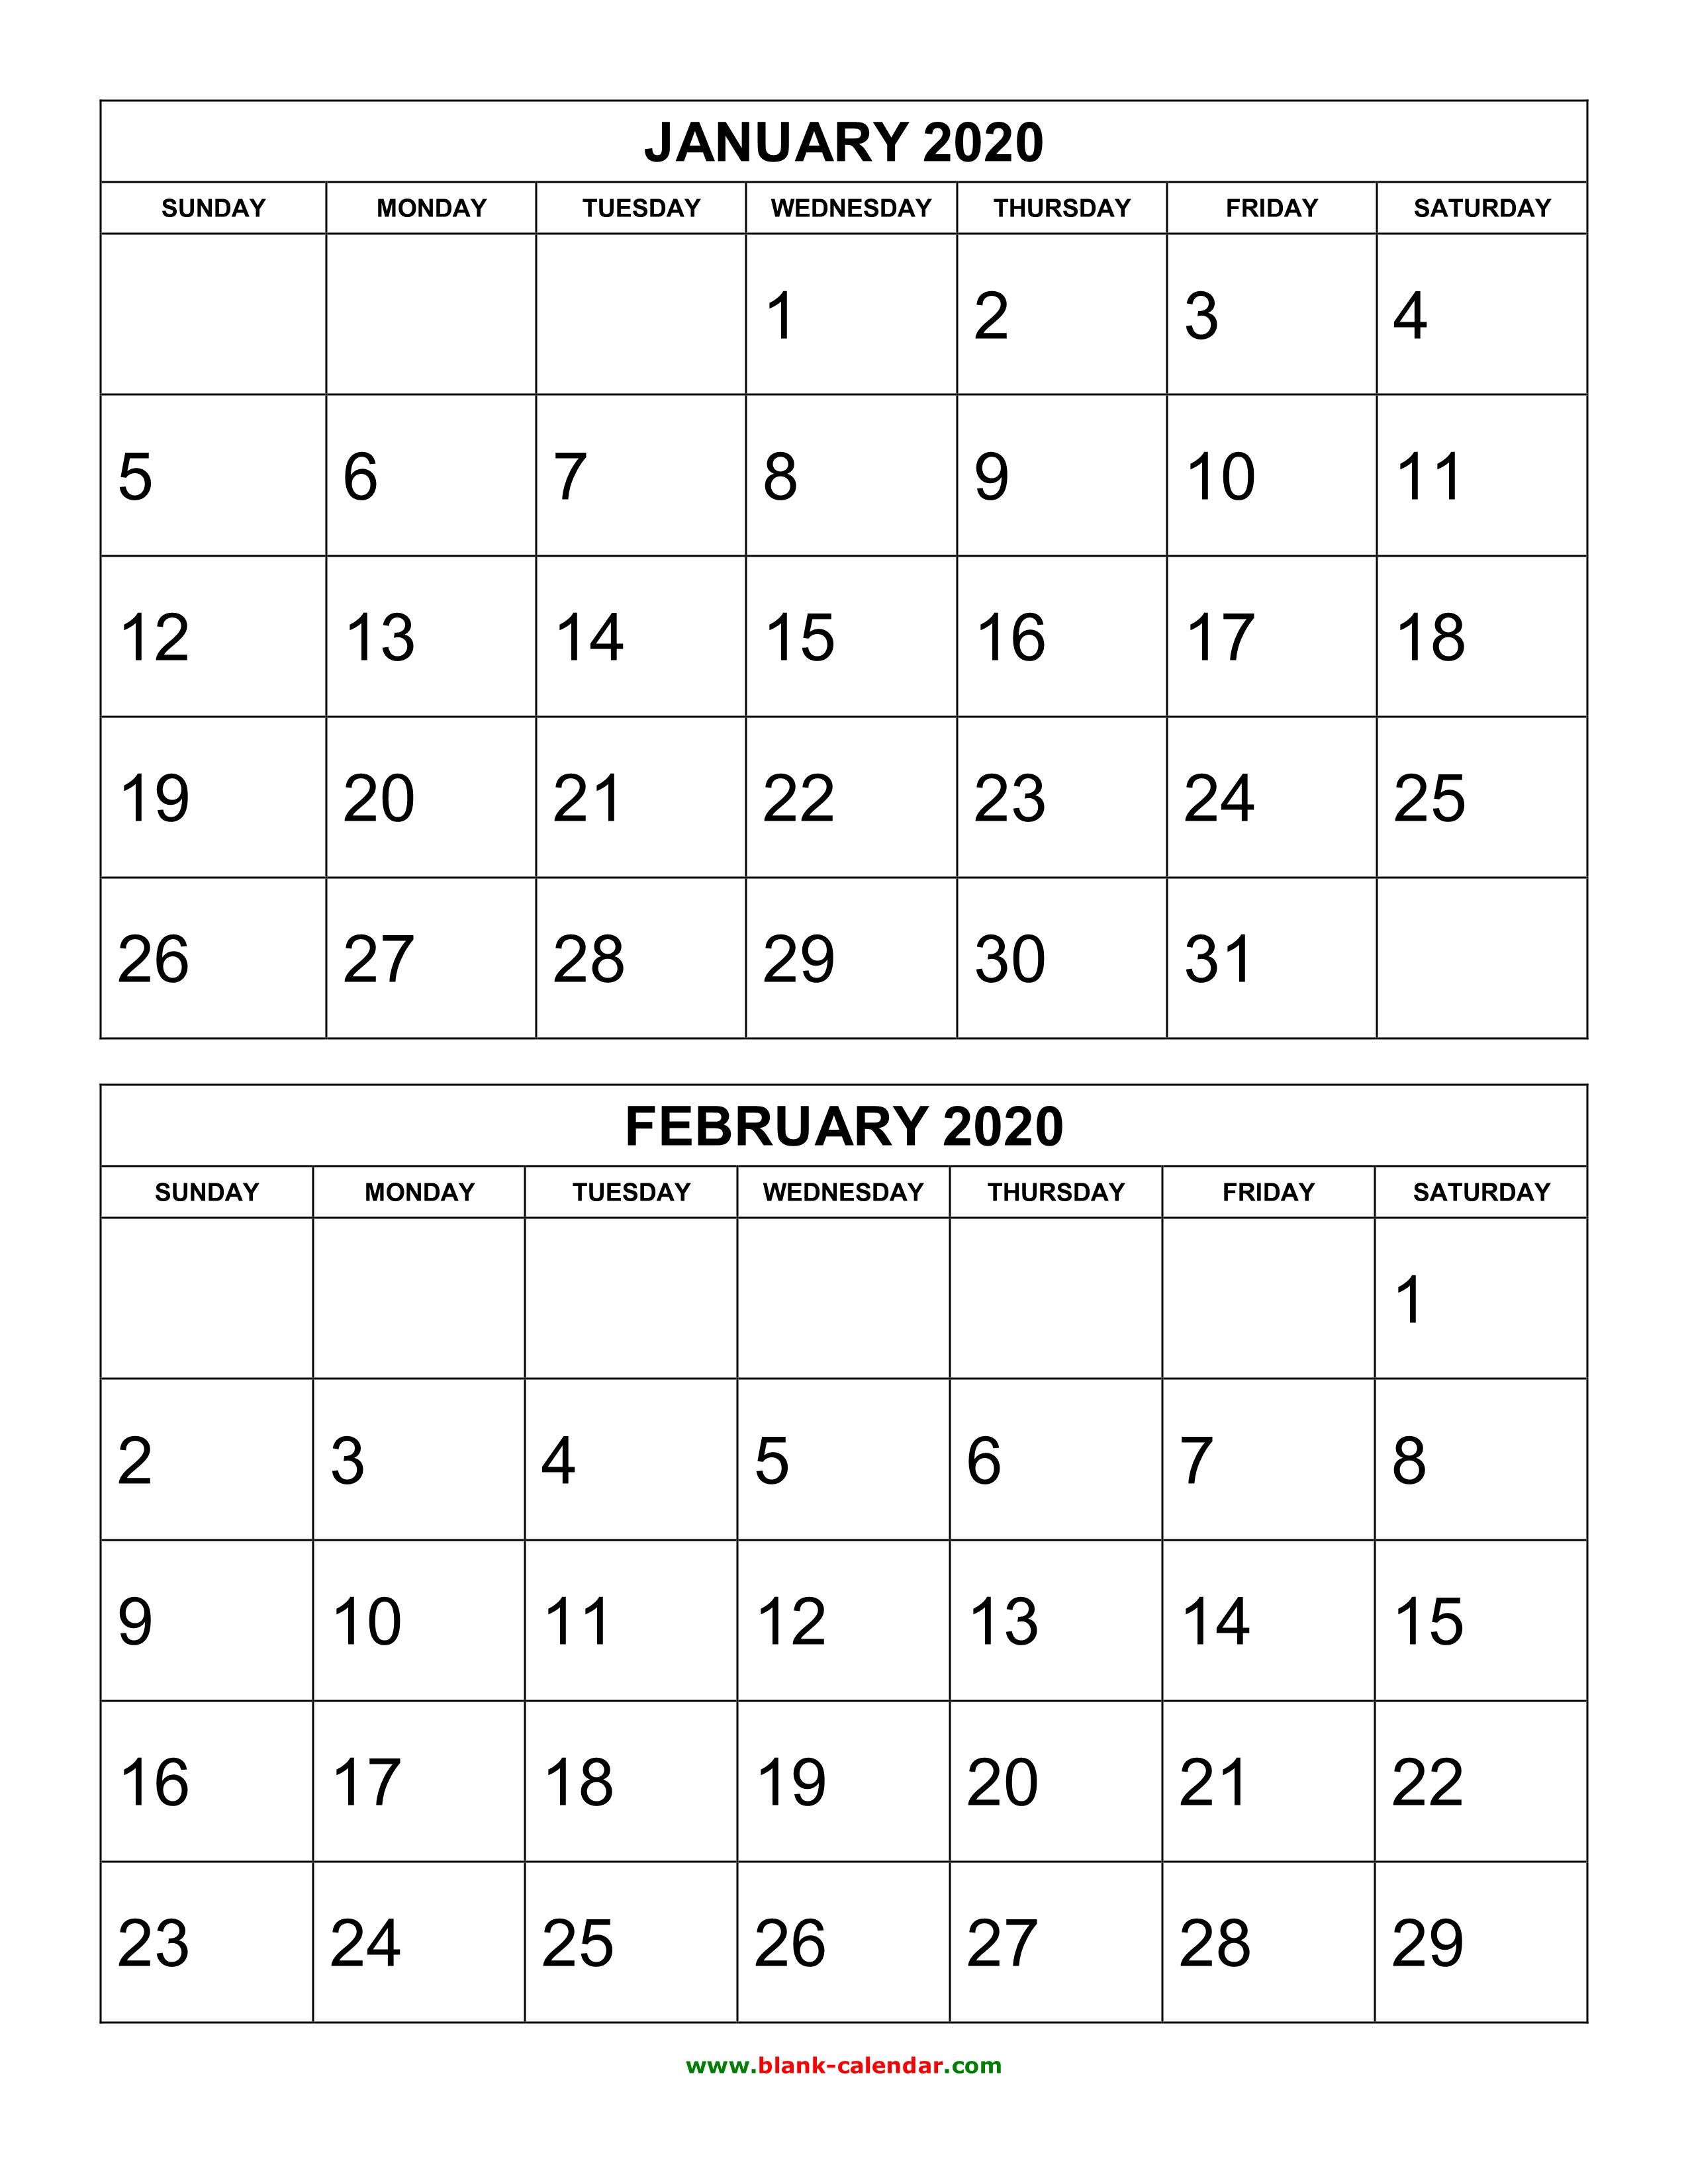 Free Download Printable Calendar 2020, 2 Months Per Page, 6 inside Printable Calendar 2020 3 Months Per Page